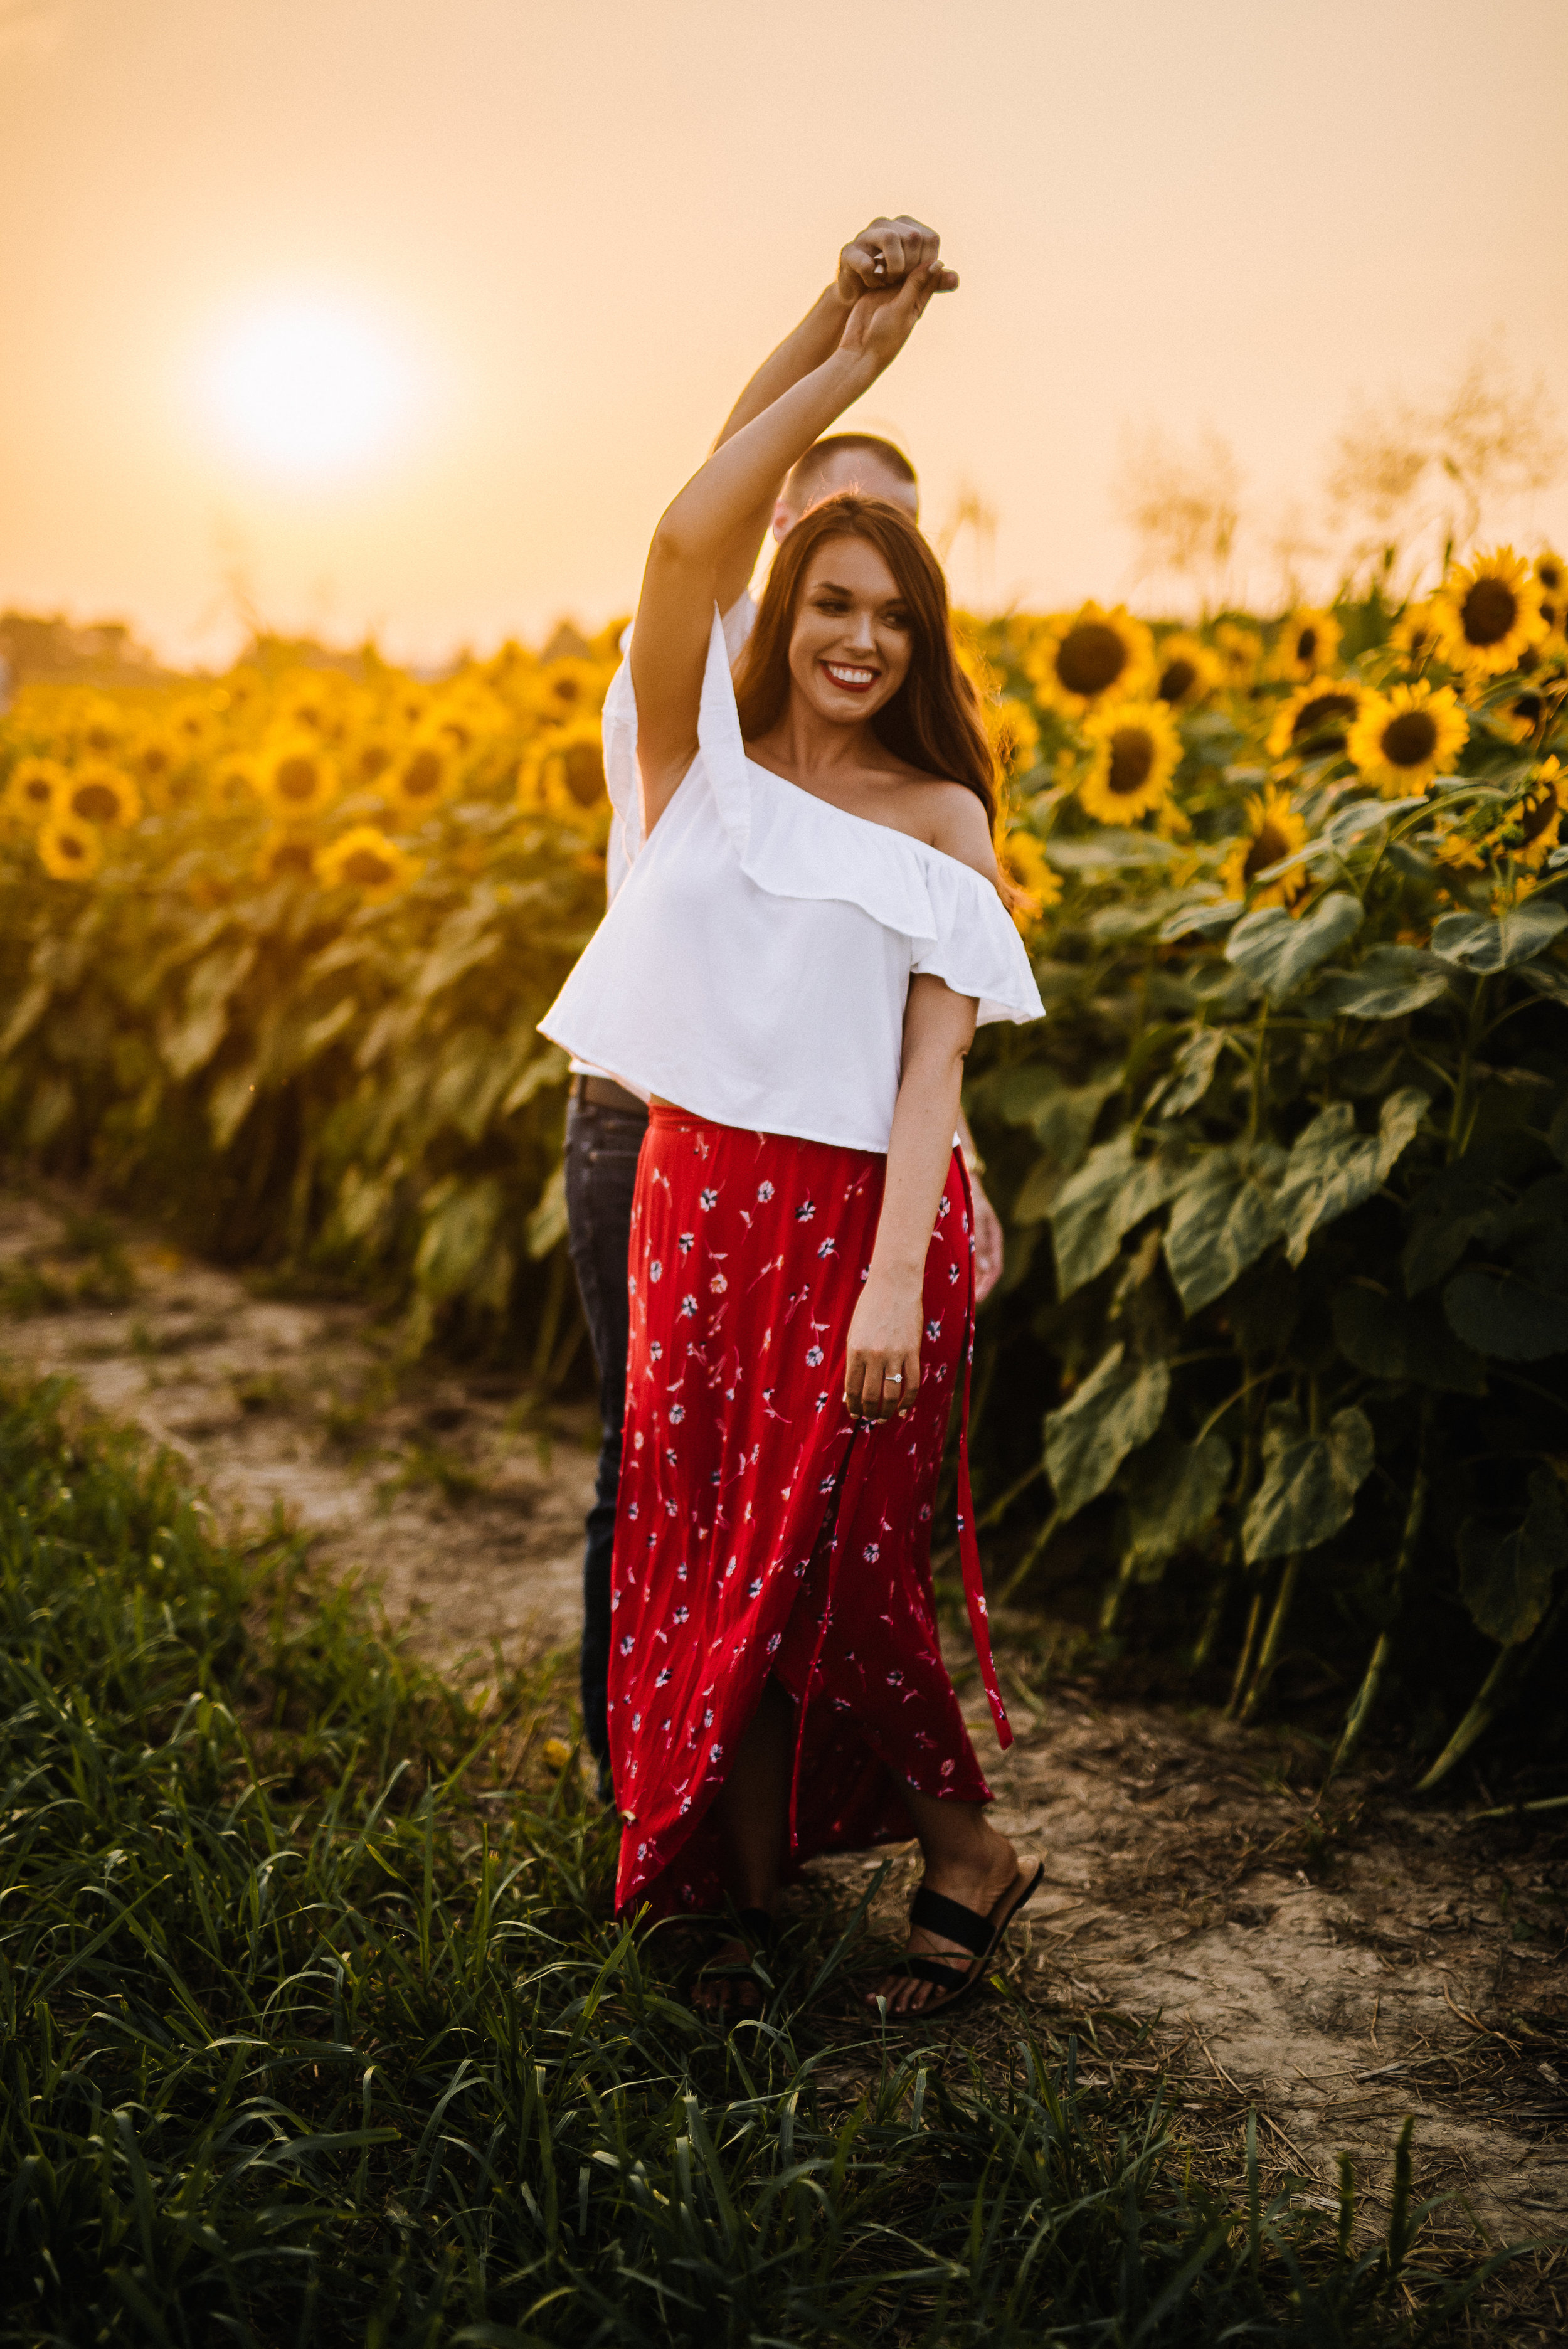 Kaitlynne&Van_Sunflowers_Ashley-Benham-Photography-20.jpg